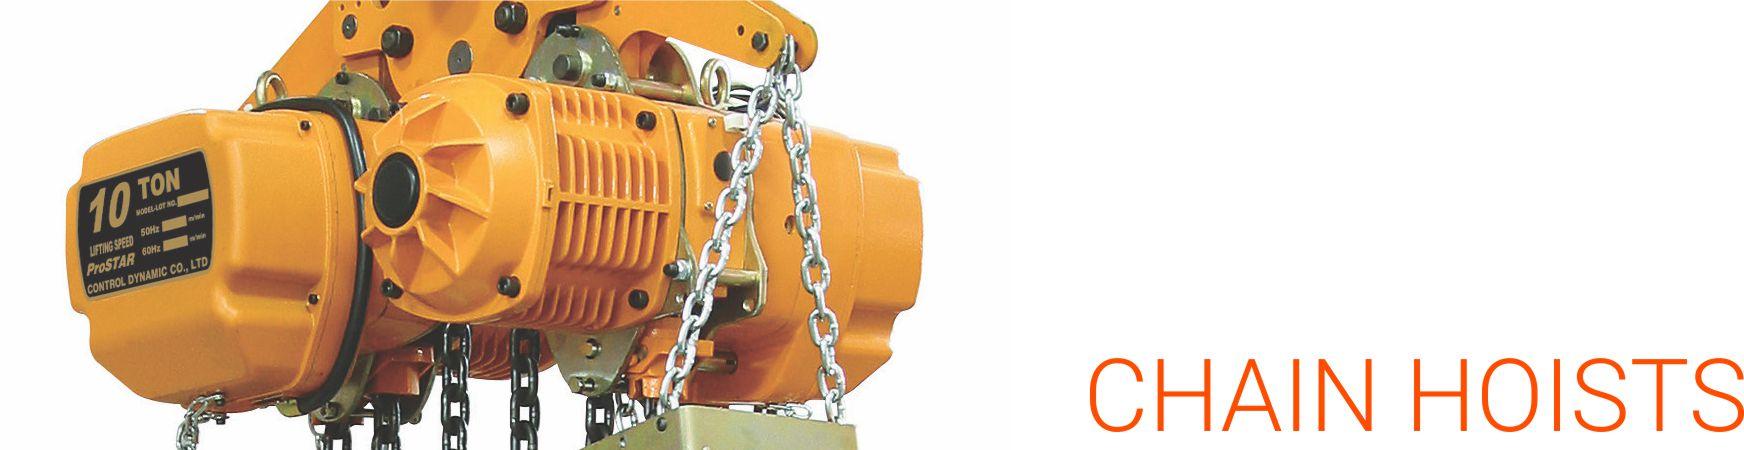 air hoists, electric chain hoists, manual chain blocks, manual lever  blocks, various trolleys